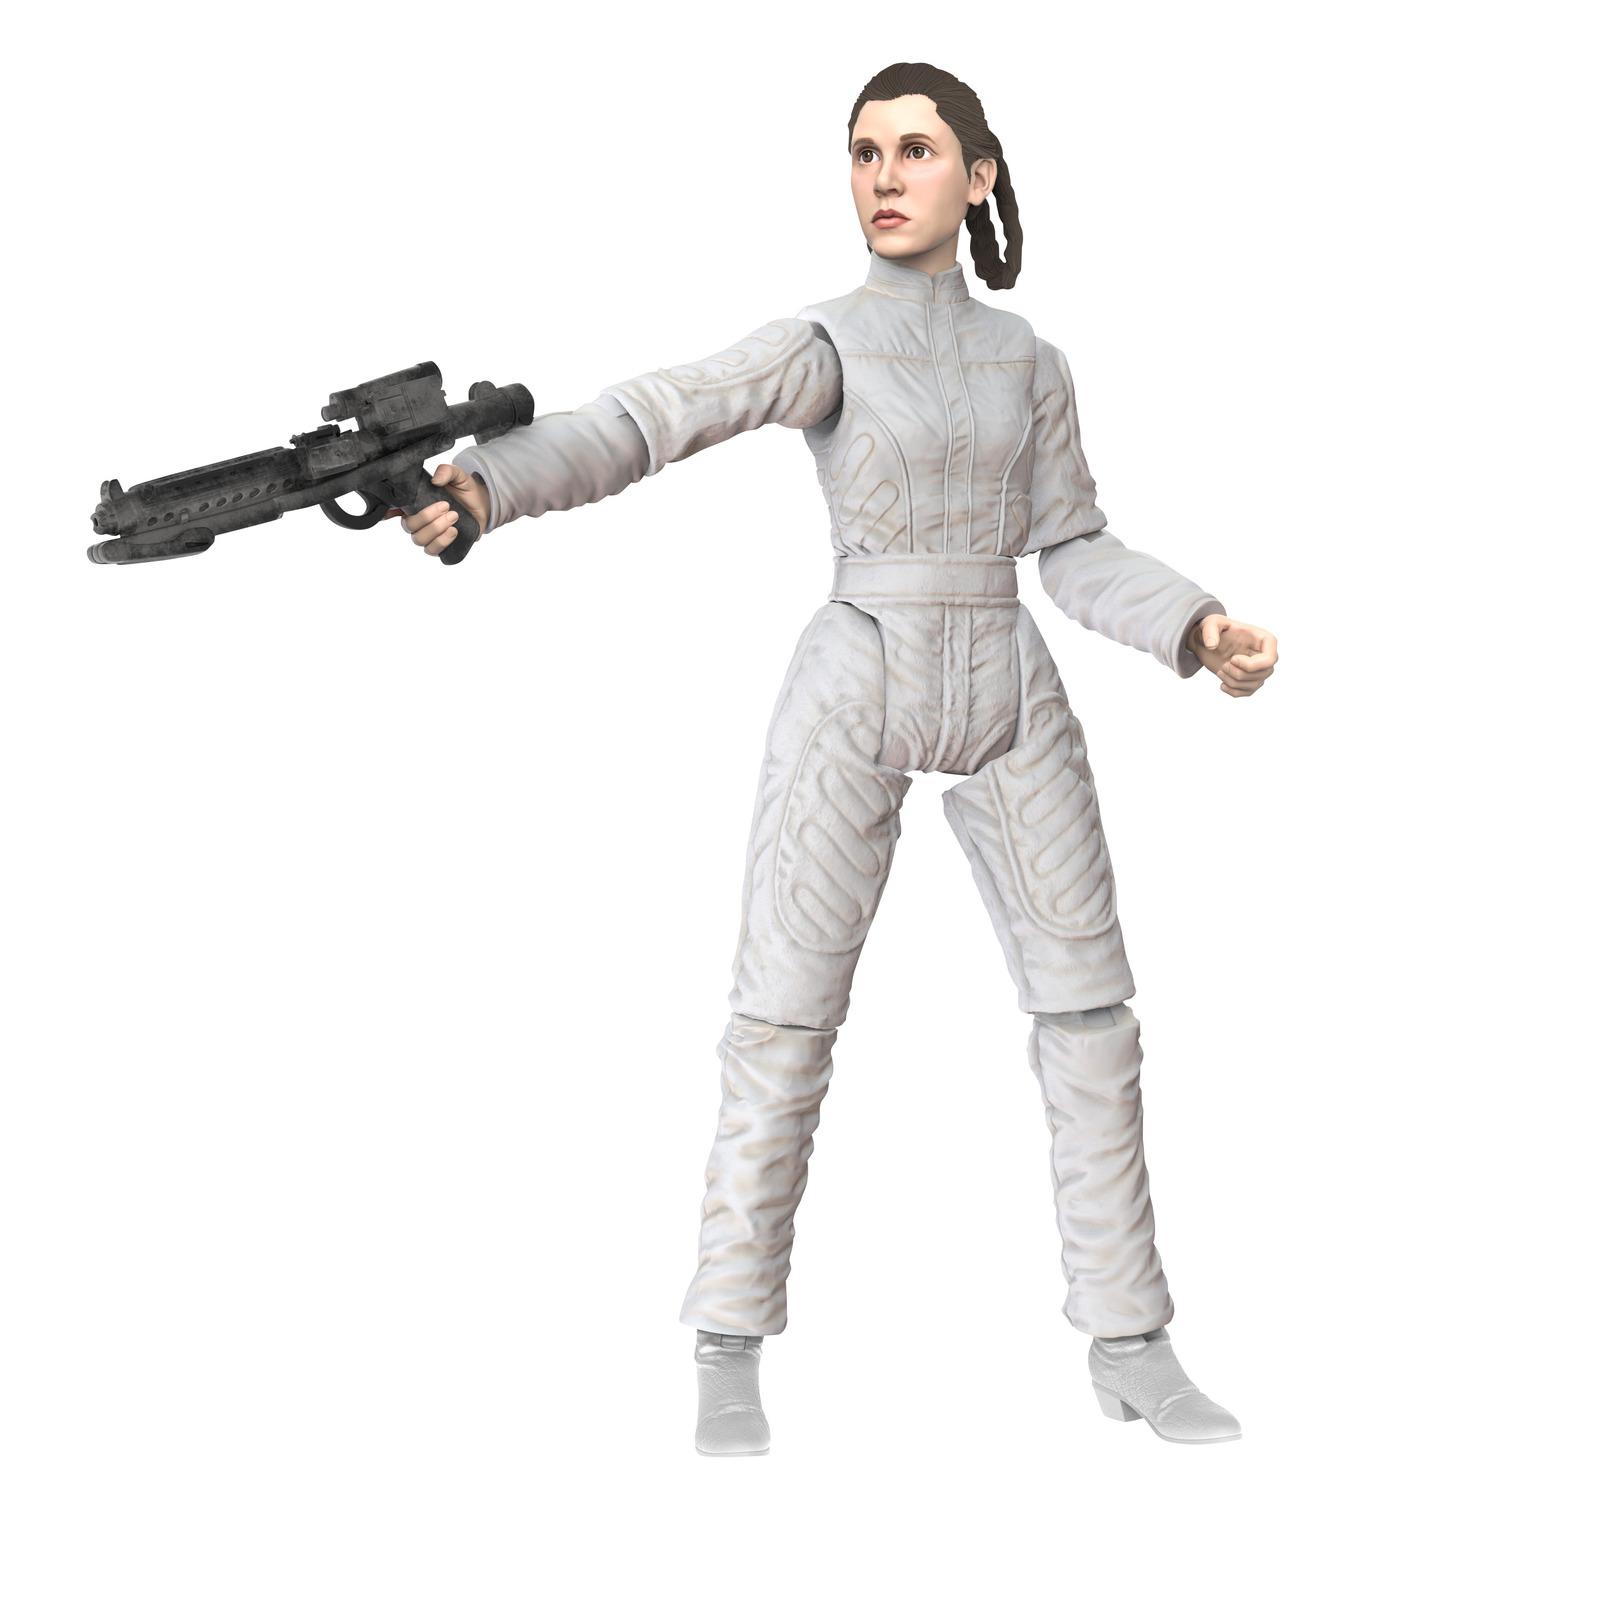 The Vintage Collection - Princess Leia image